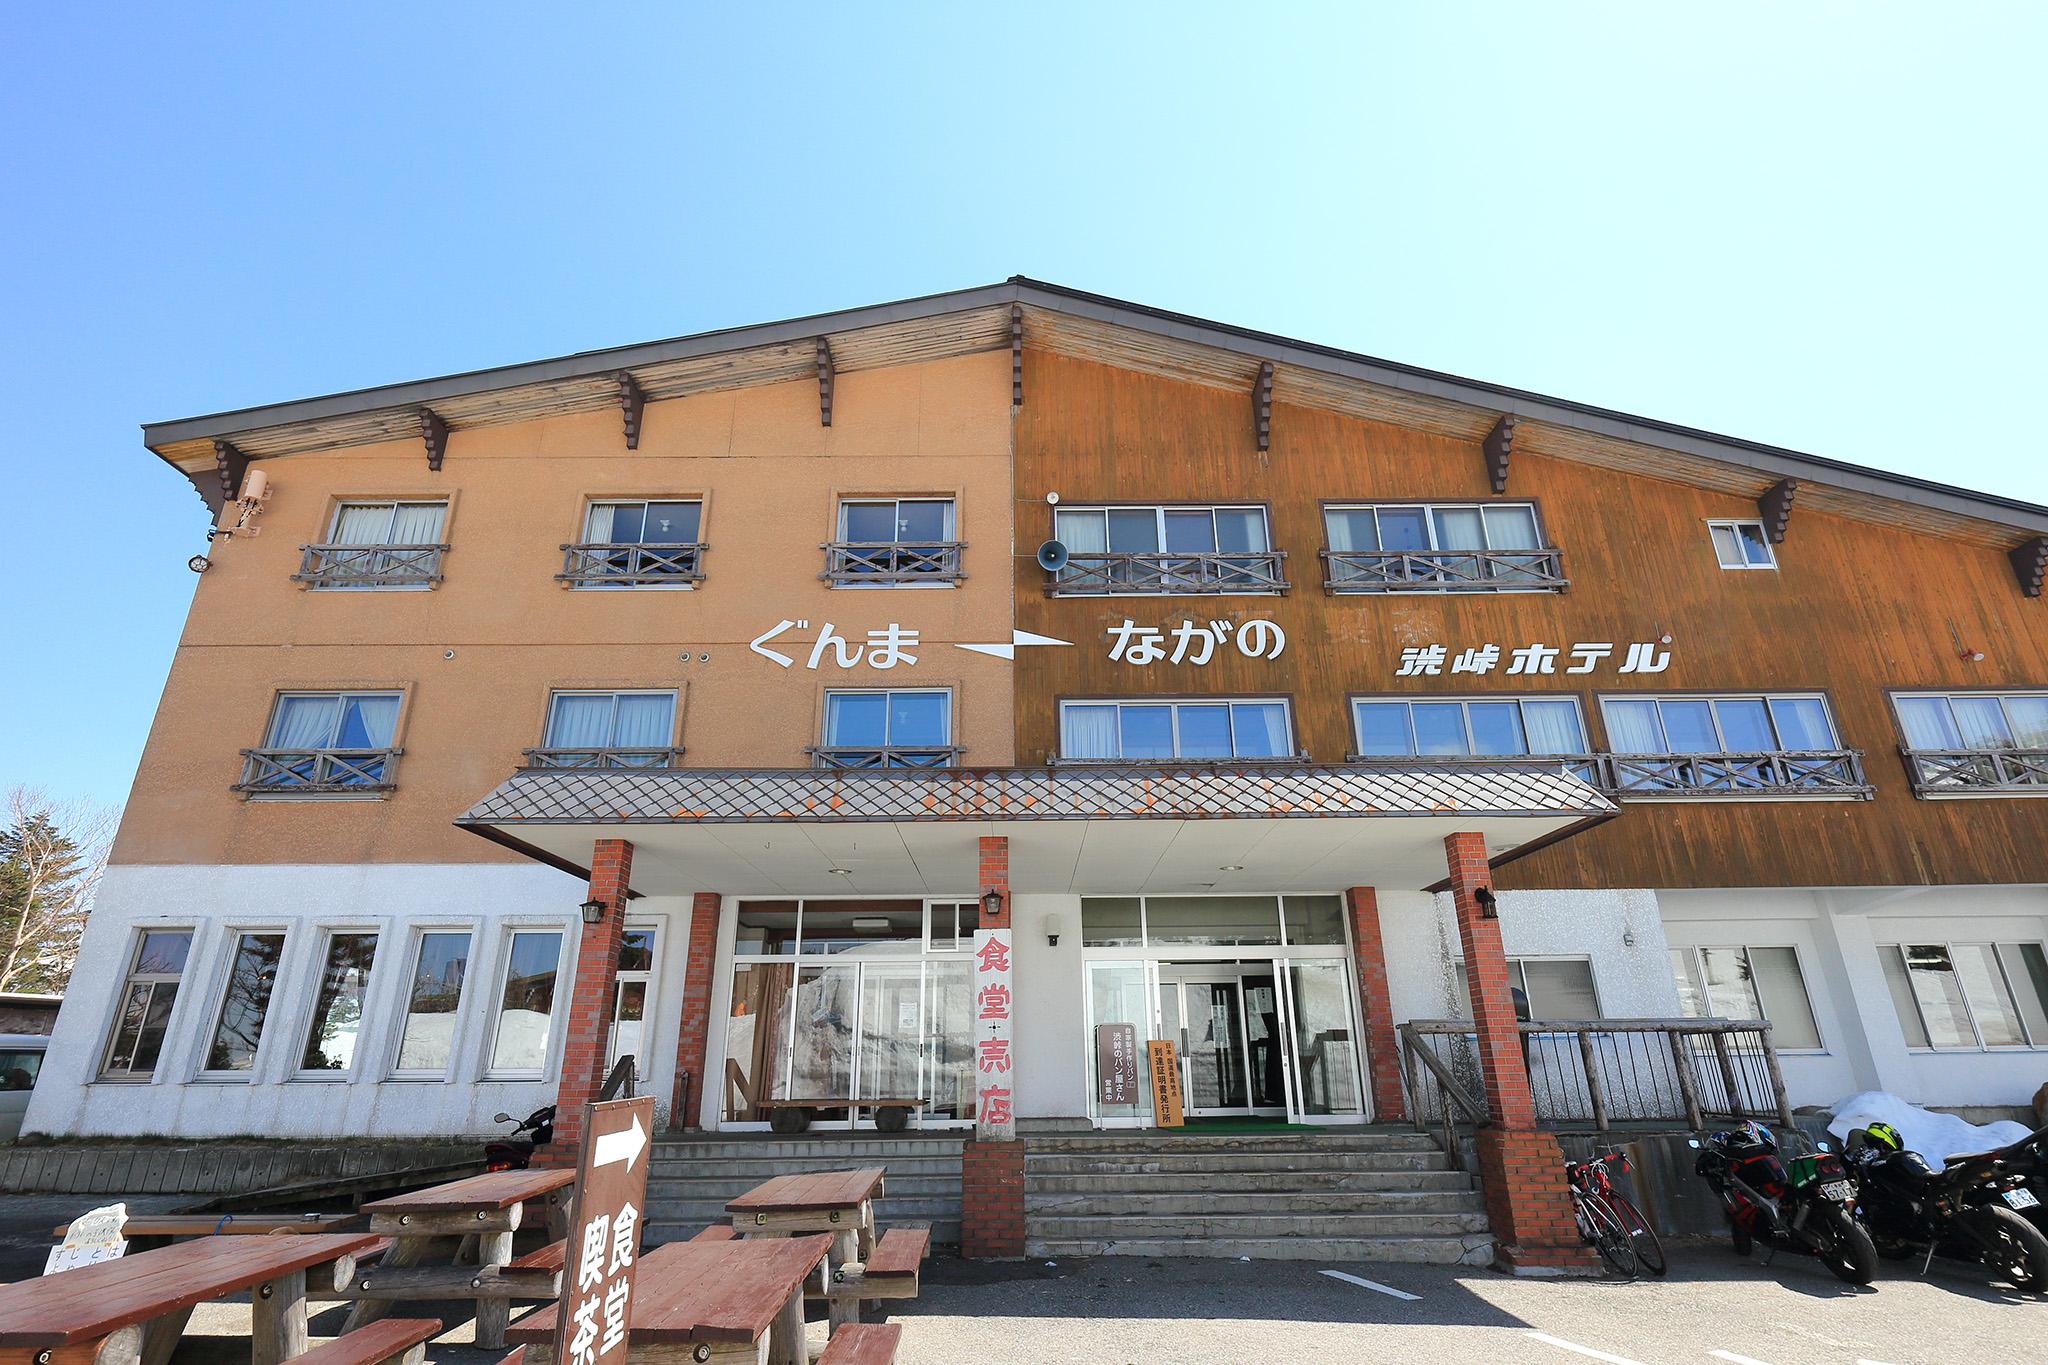 20150425_shibu20_2048